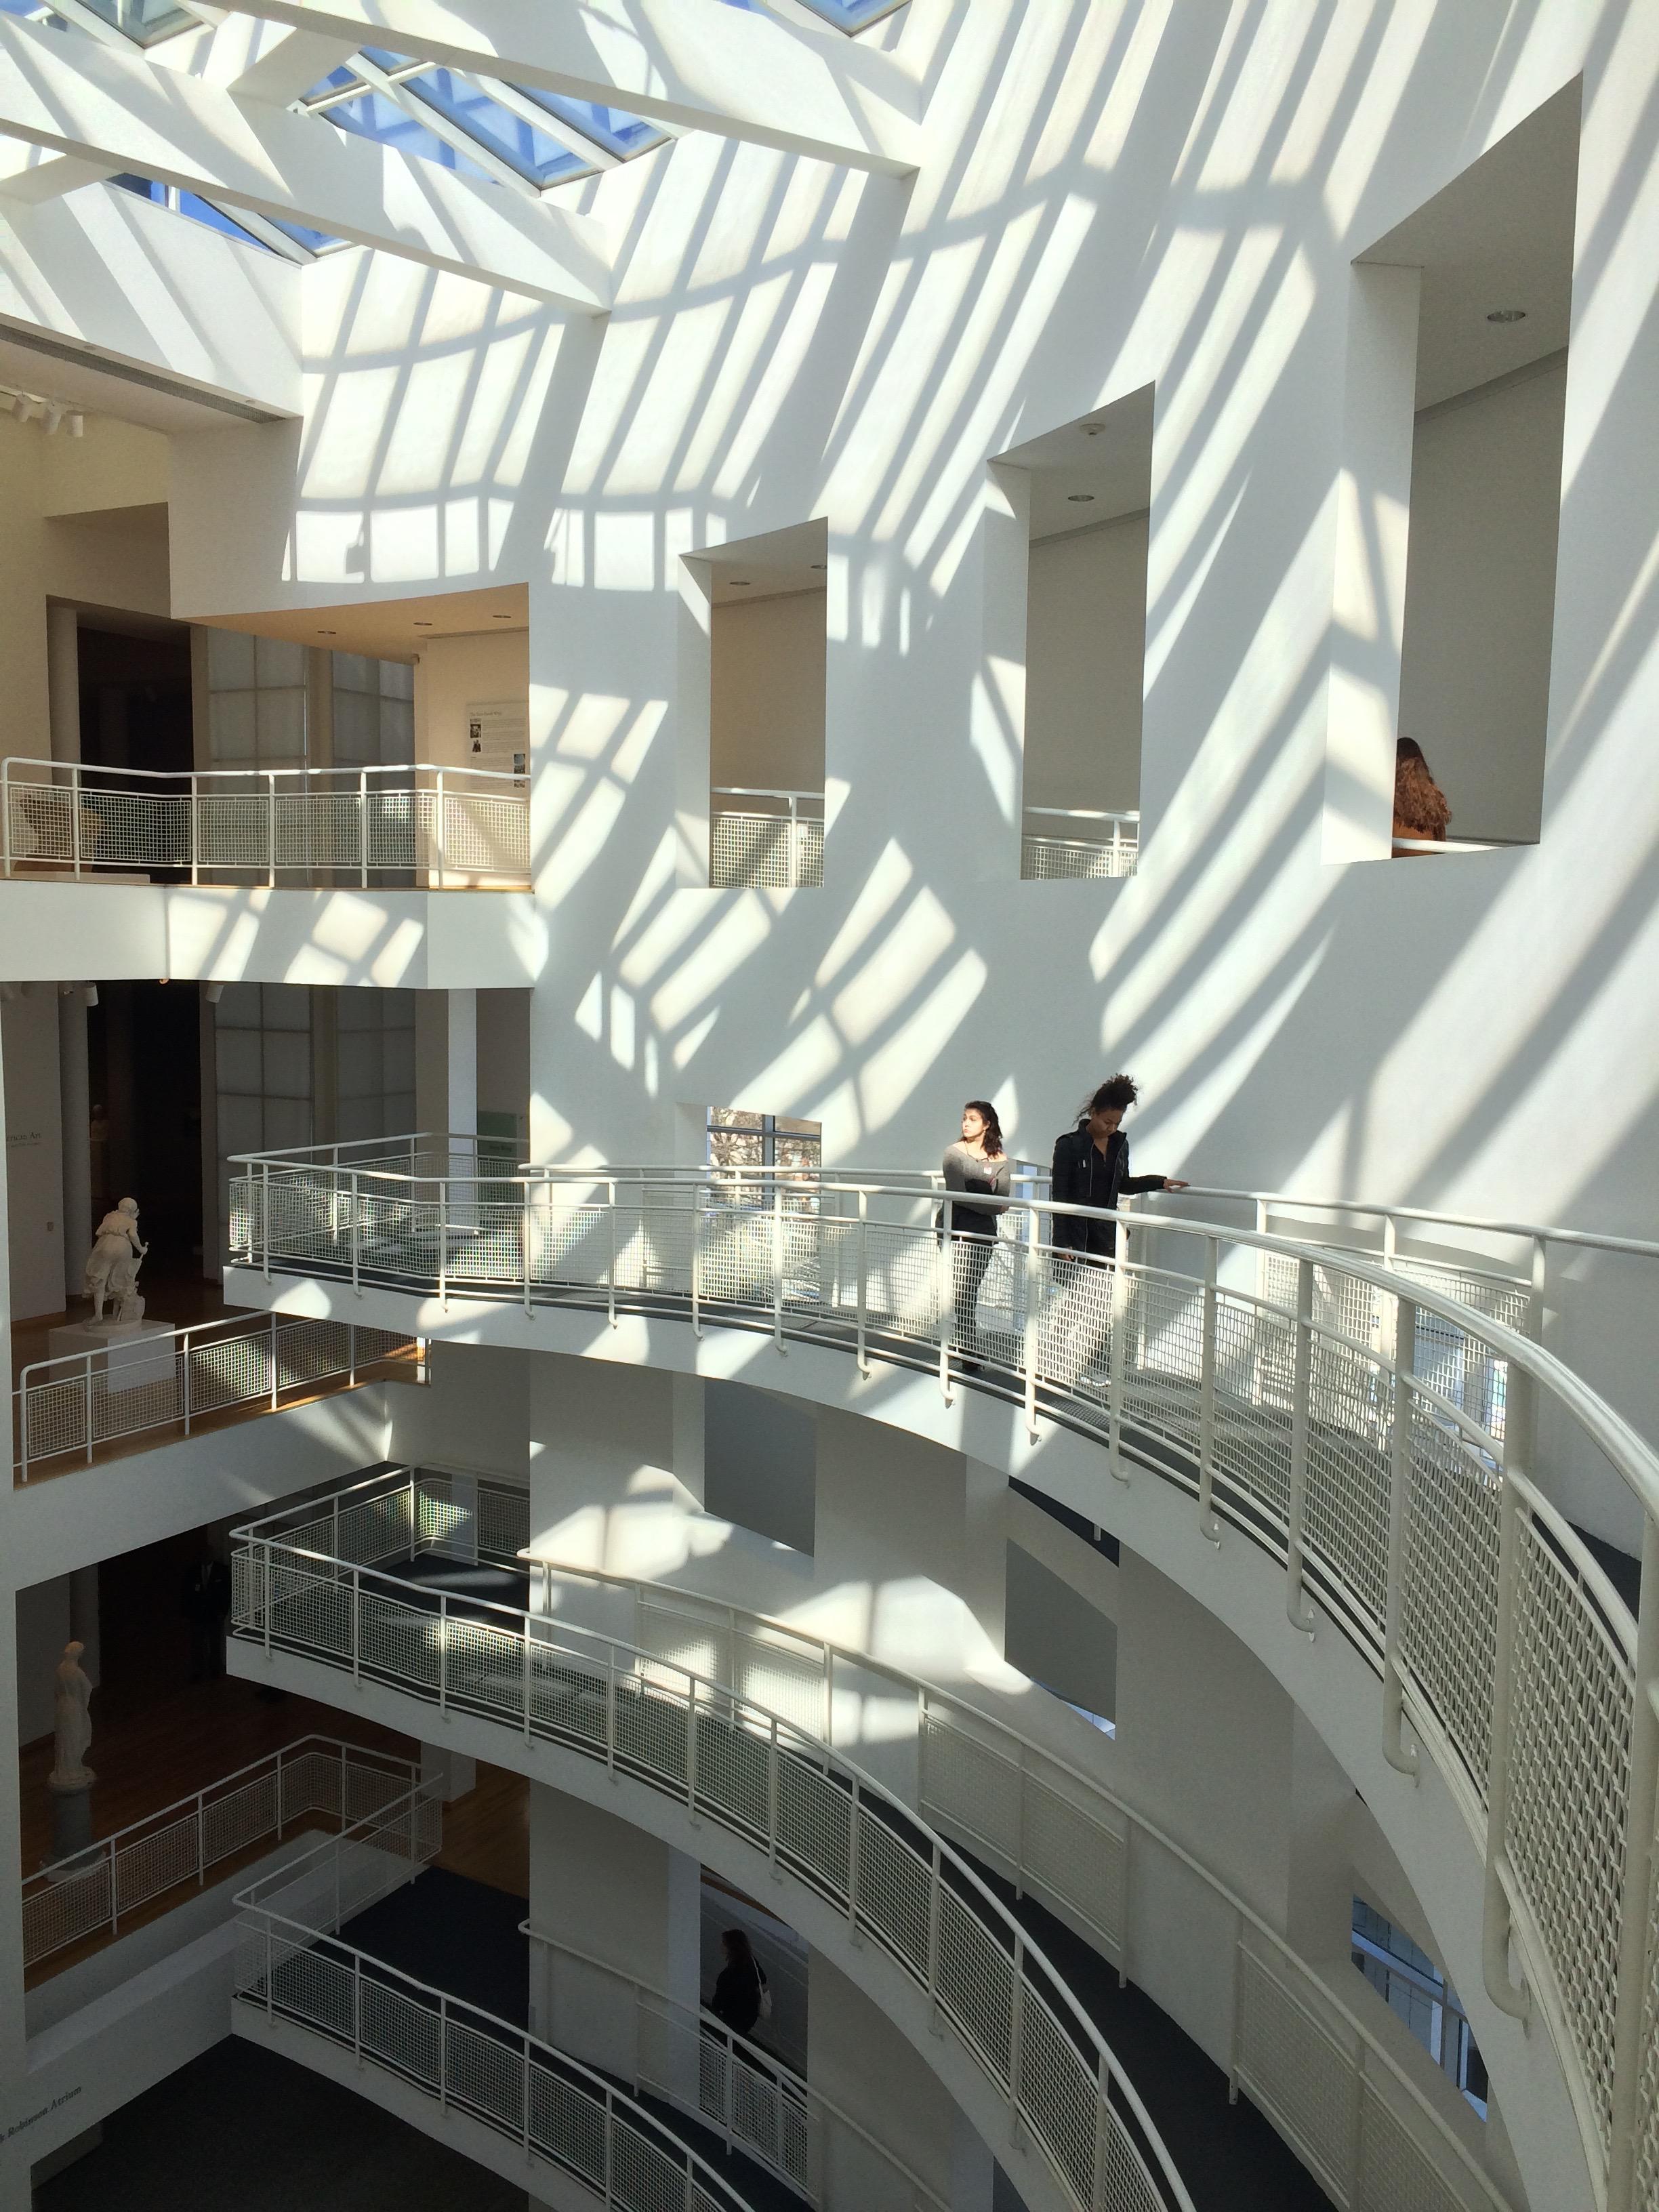 Interior of the High Museum of Art in Atlanta